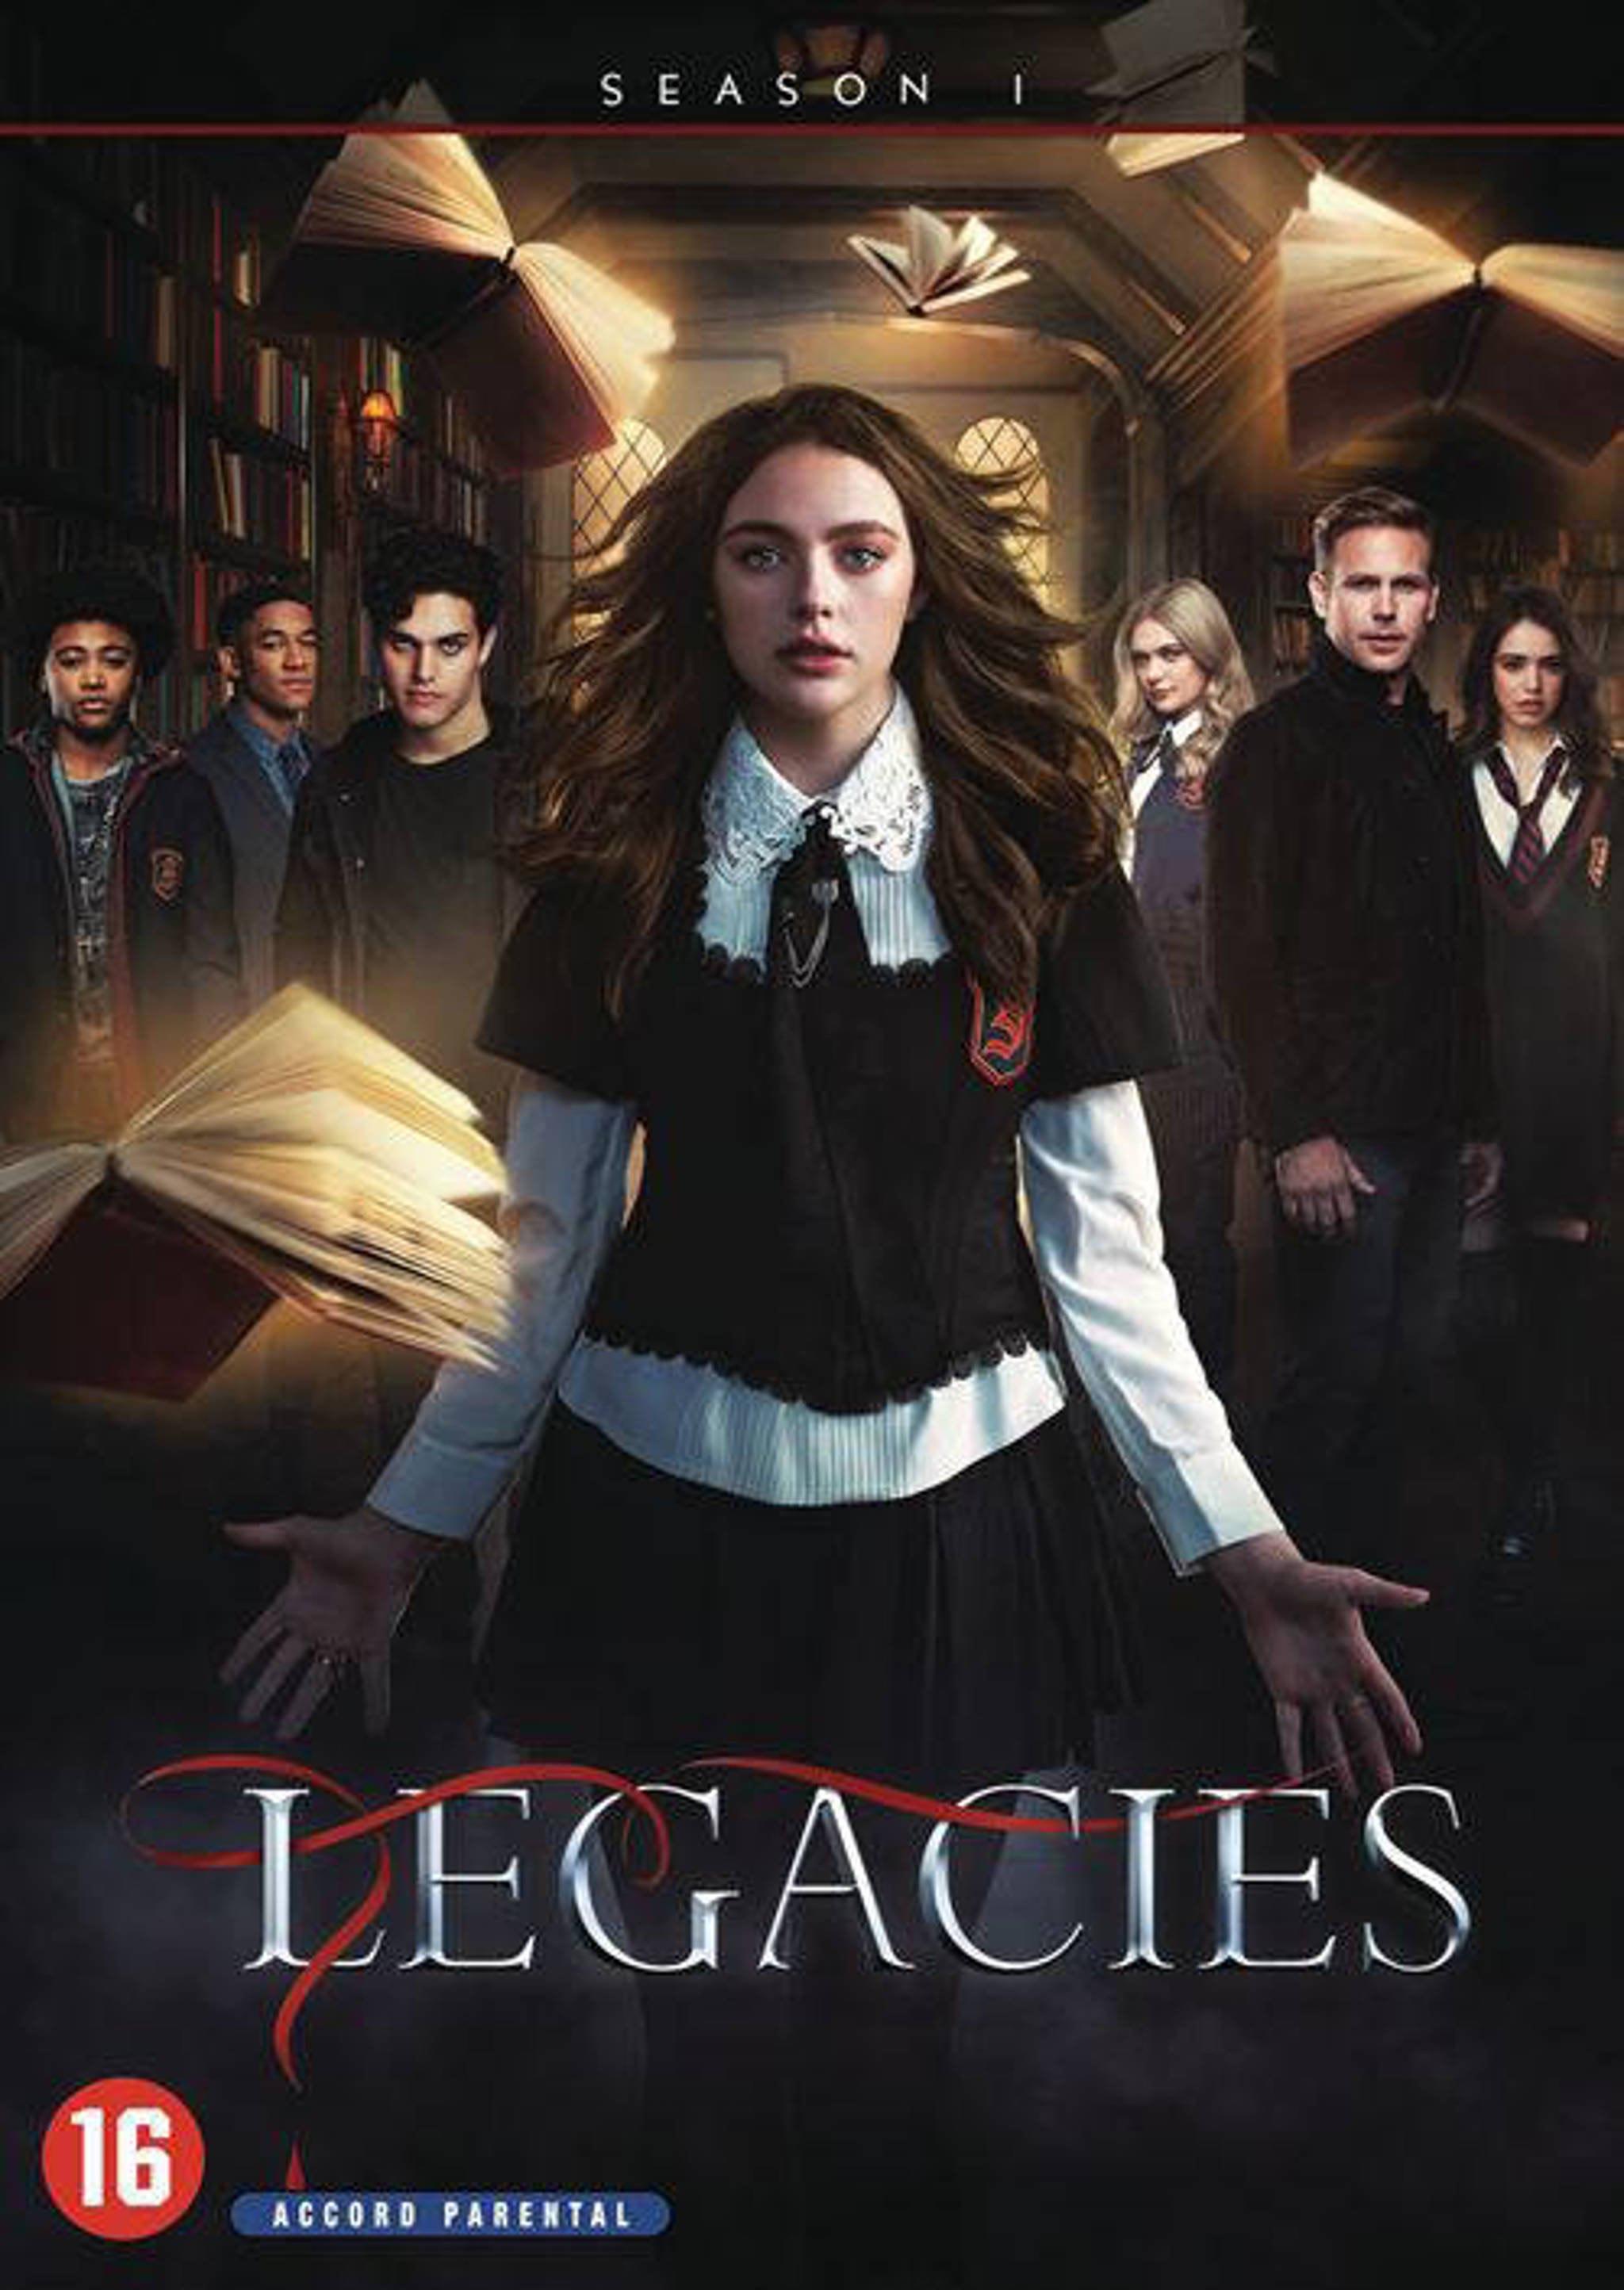 Legacies Seizoen 1 DVD (Vampire Diaries/Originals)